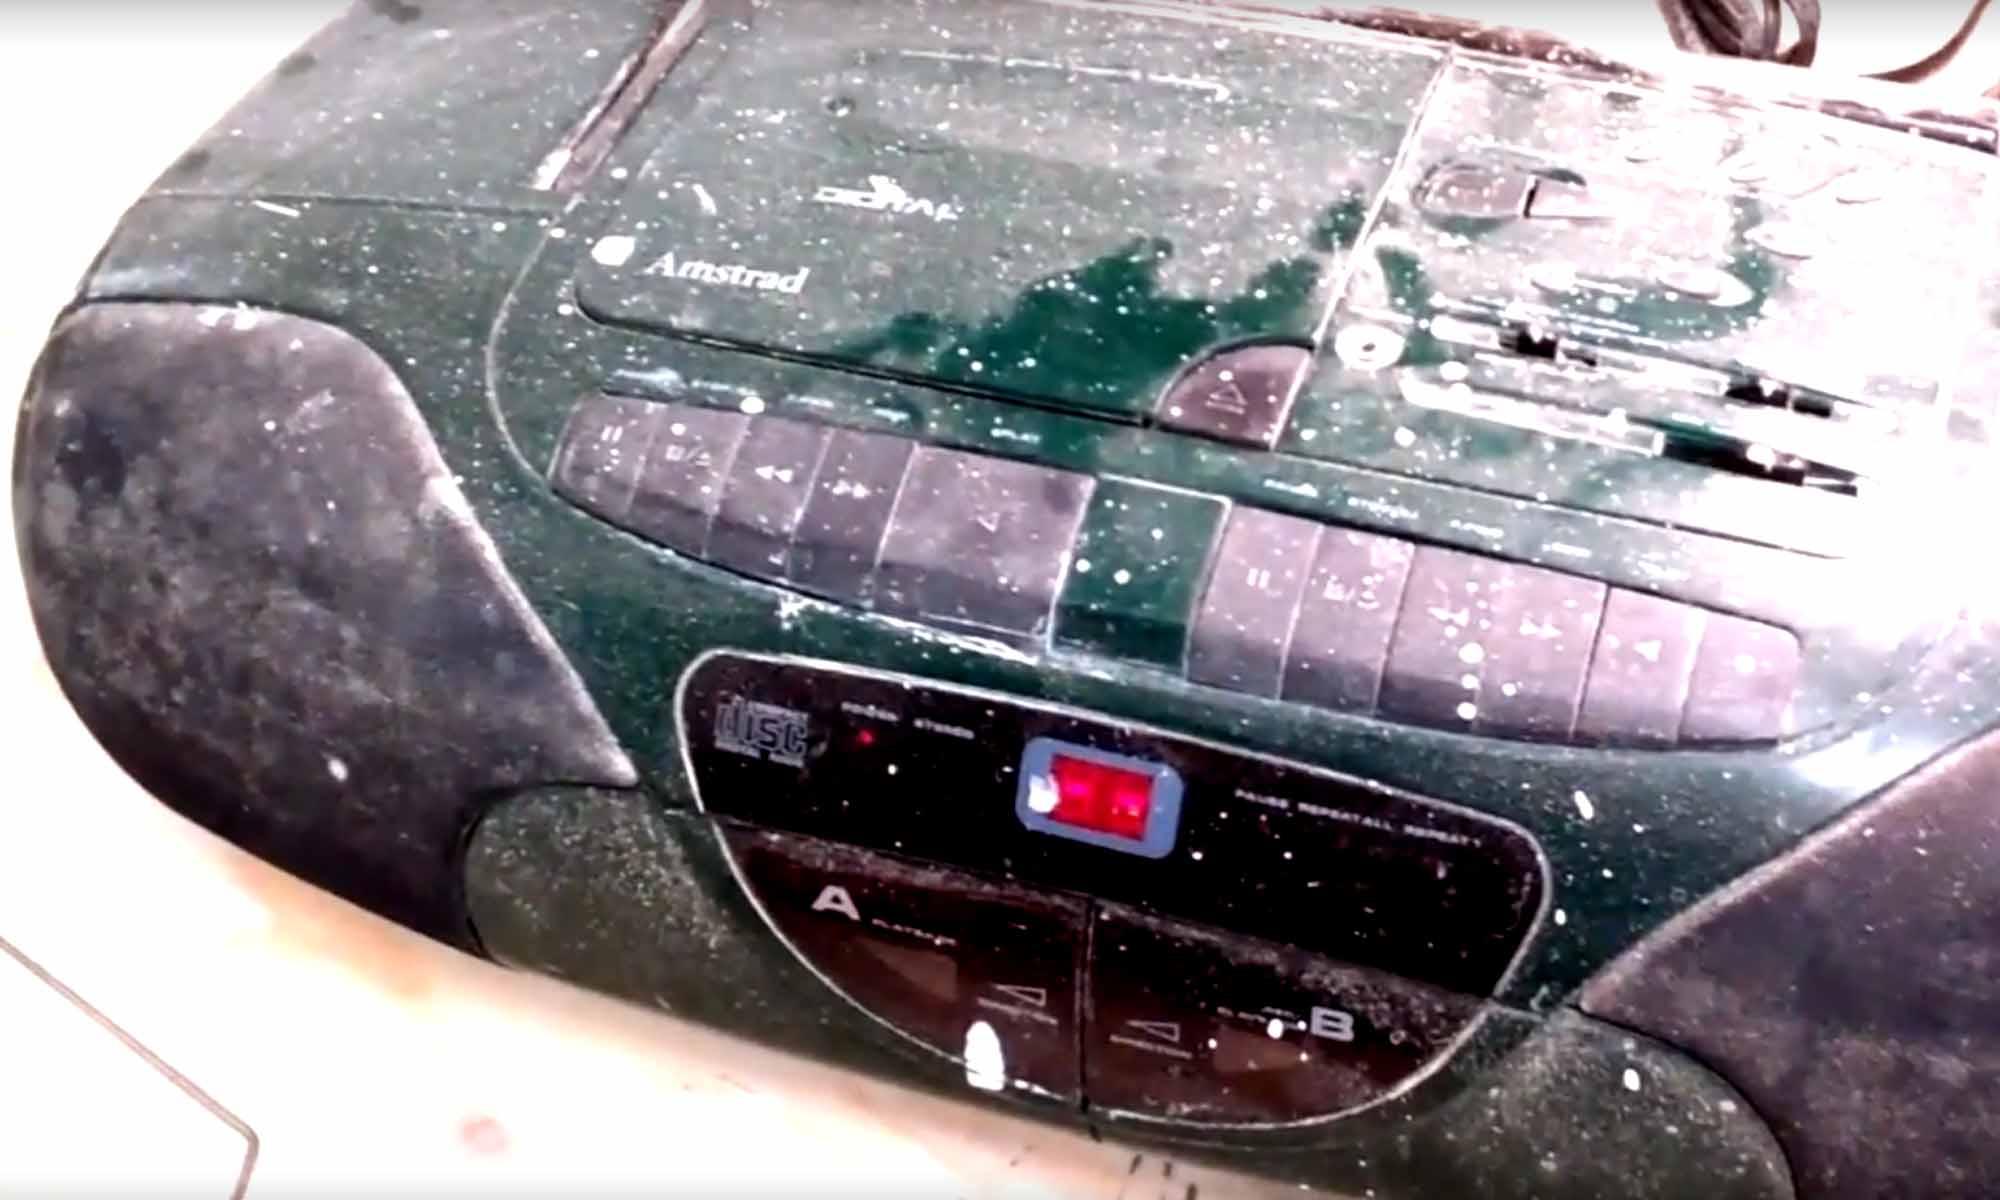 Amstrad Radio